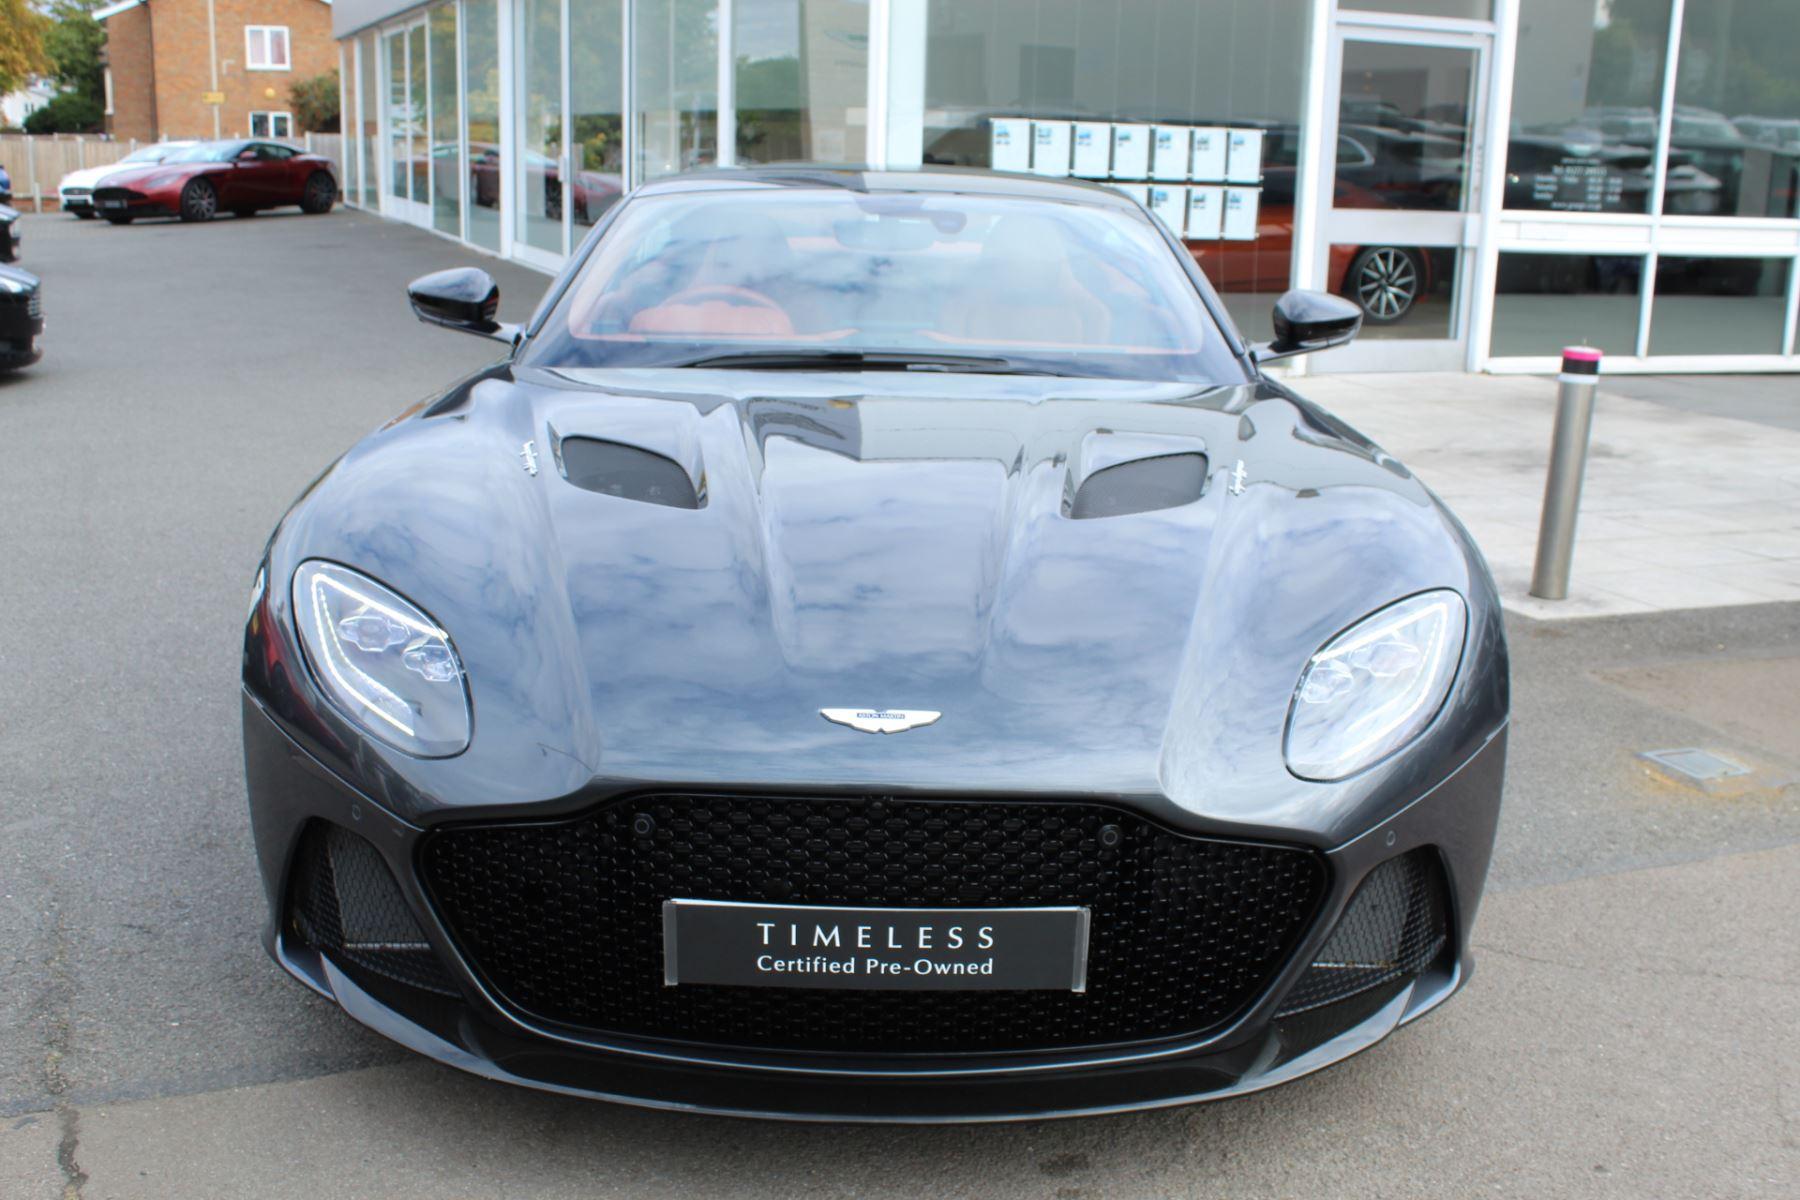 Aston Martin DBS V12 Superleggera 2dr Touchtronic image 31